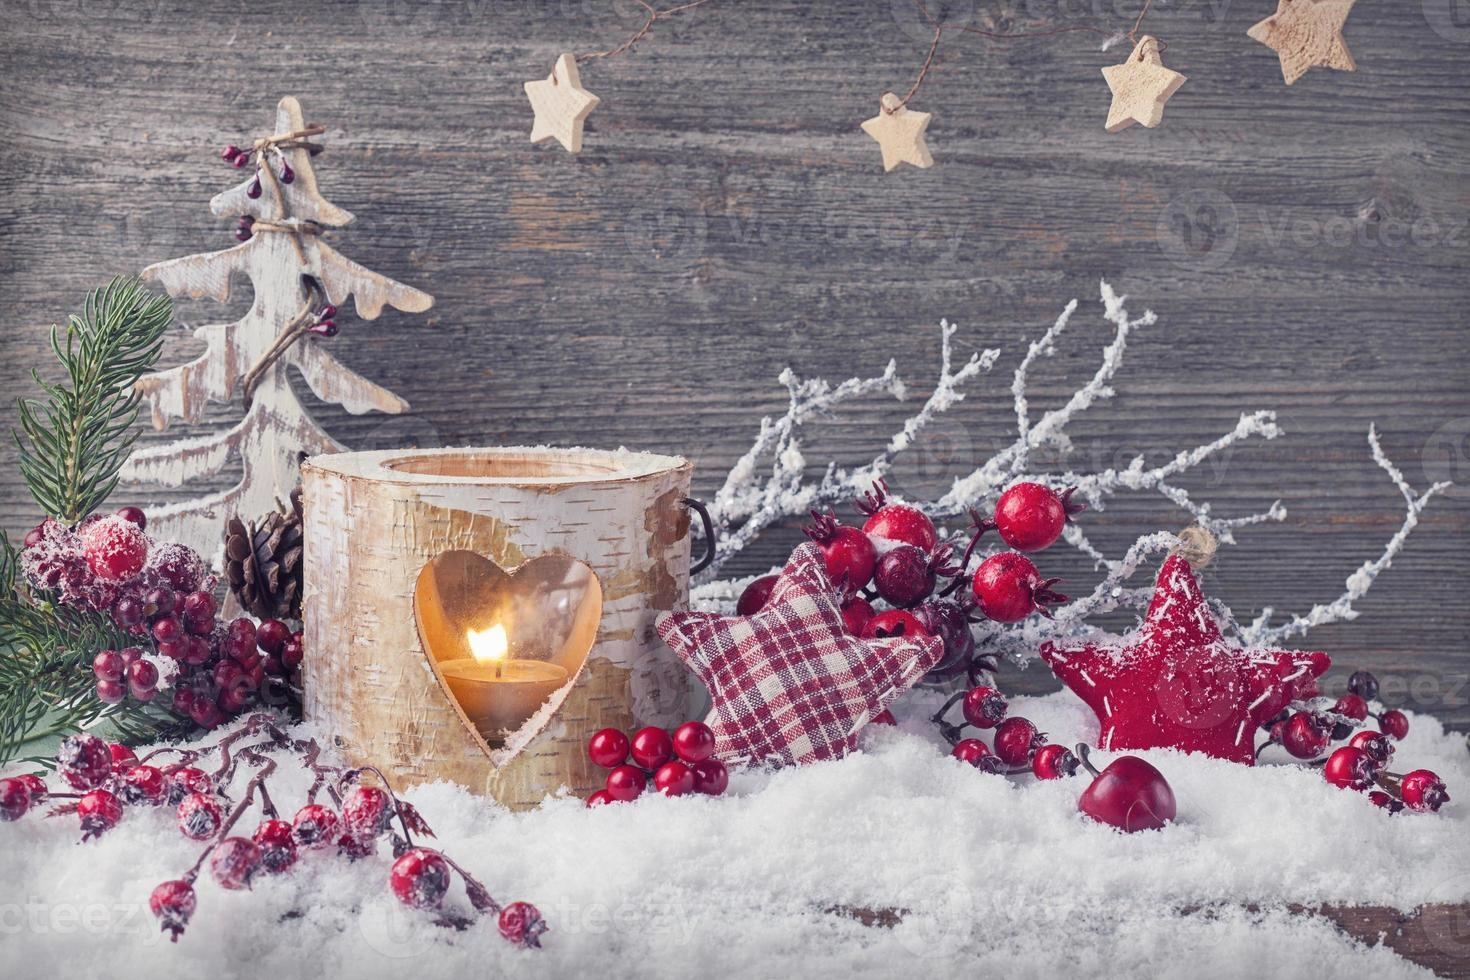 bougies d'hiver photo